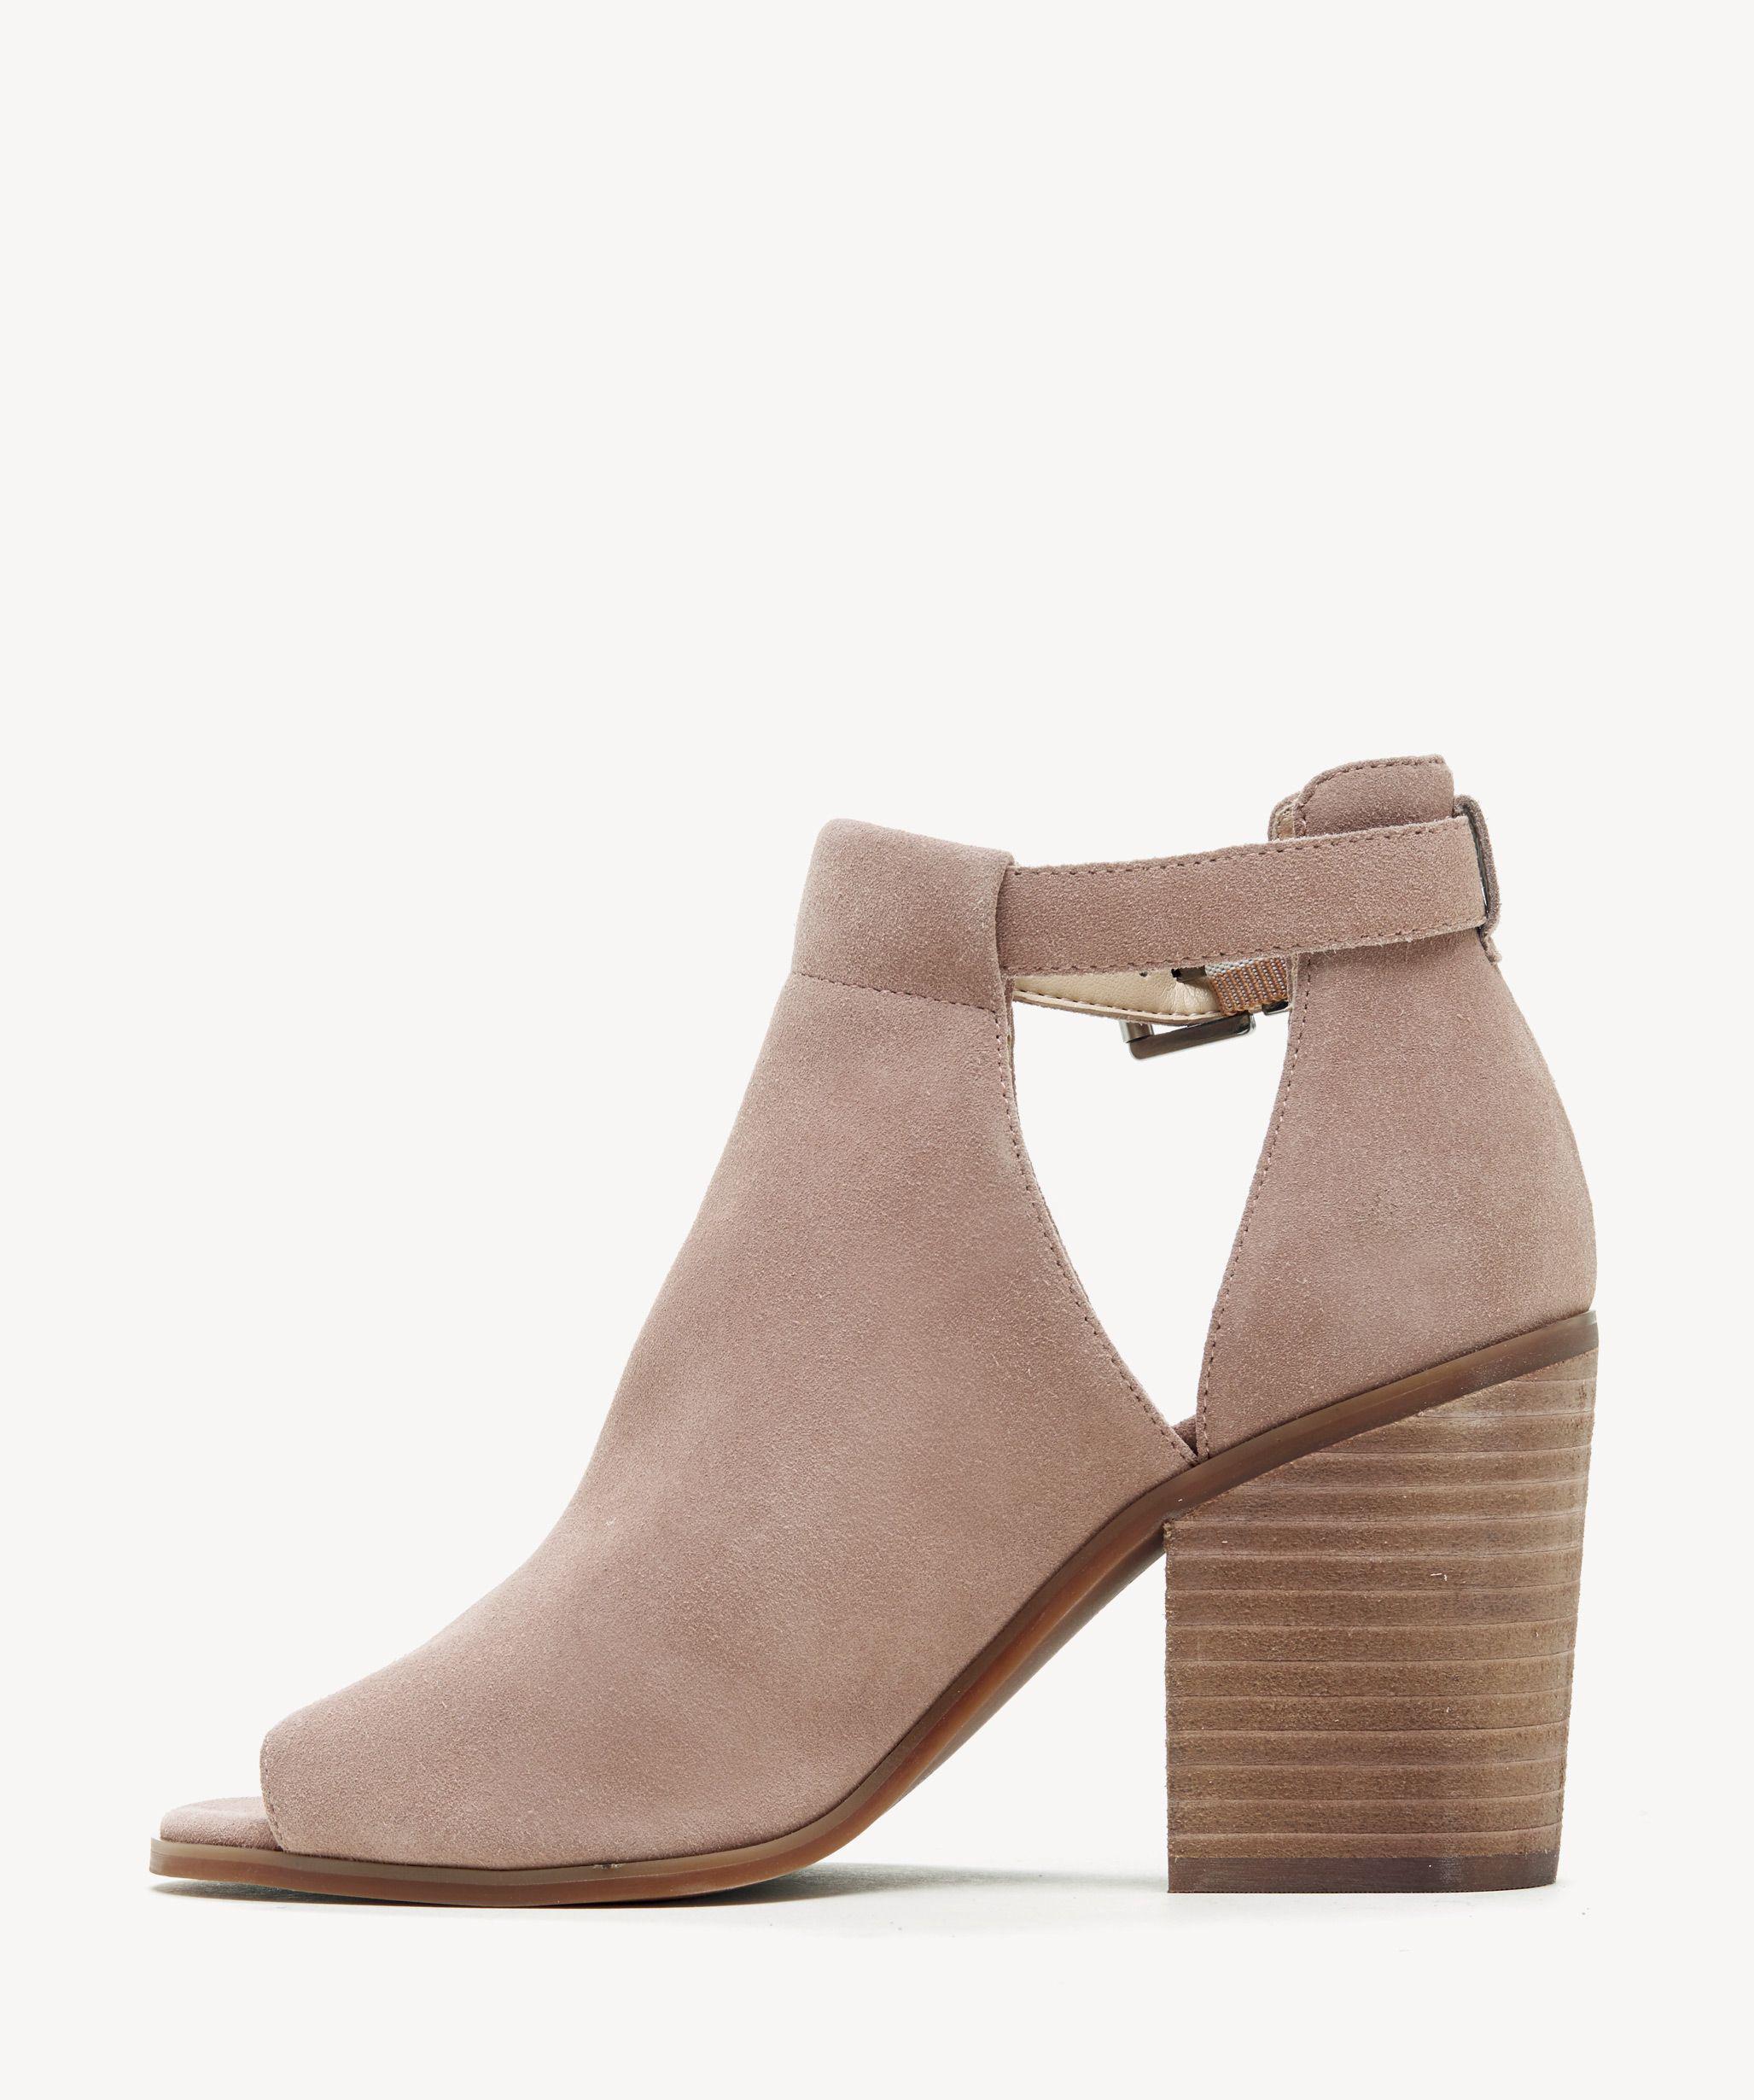 05106f9d5e1 Lyst - Sole Society Ferris Block Heel Sandal